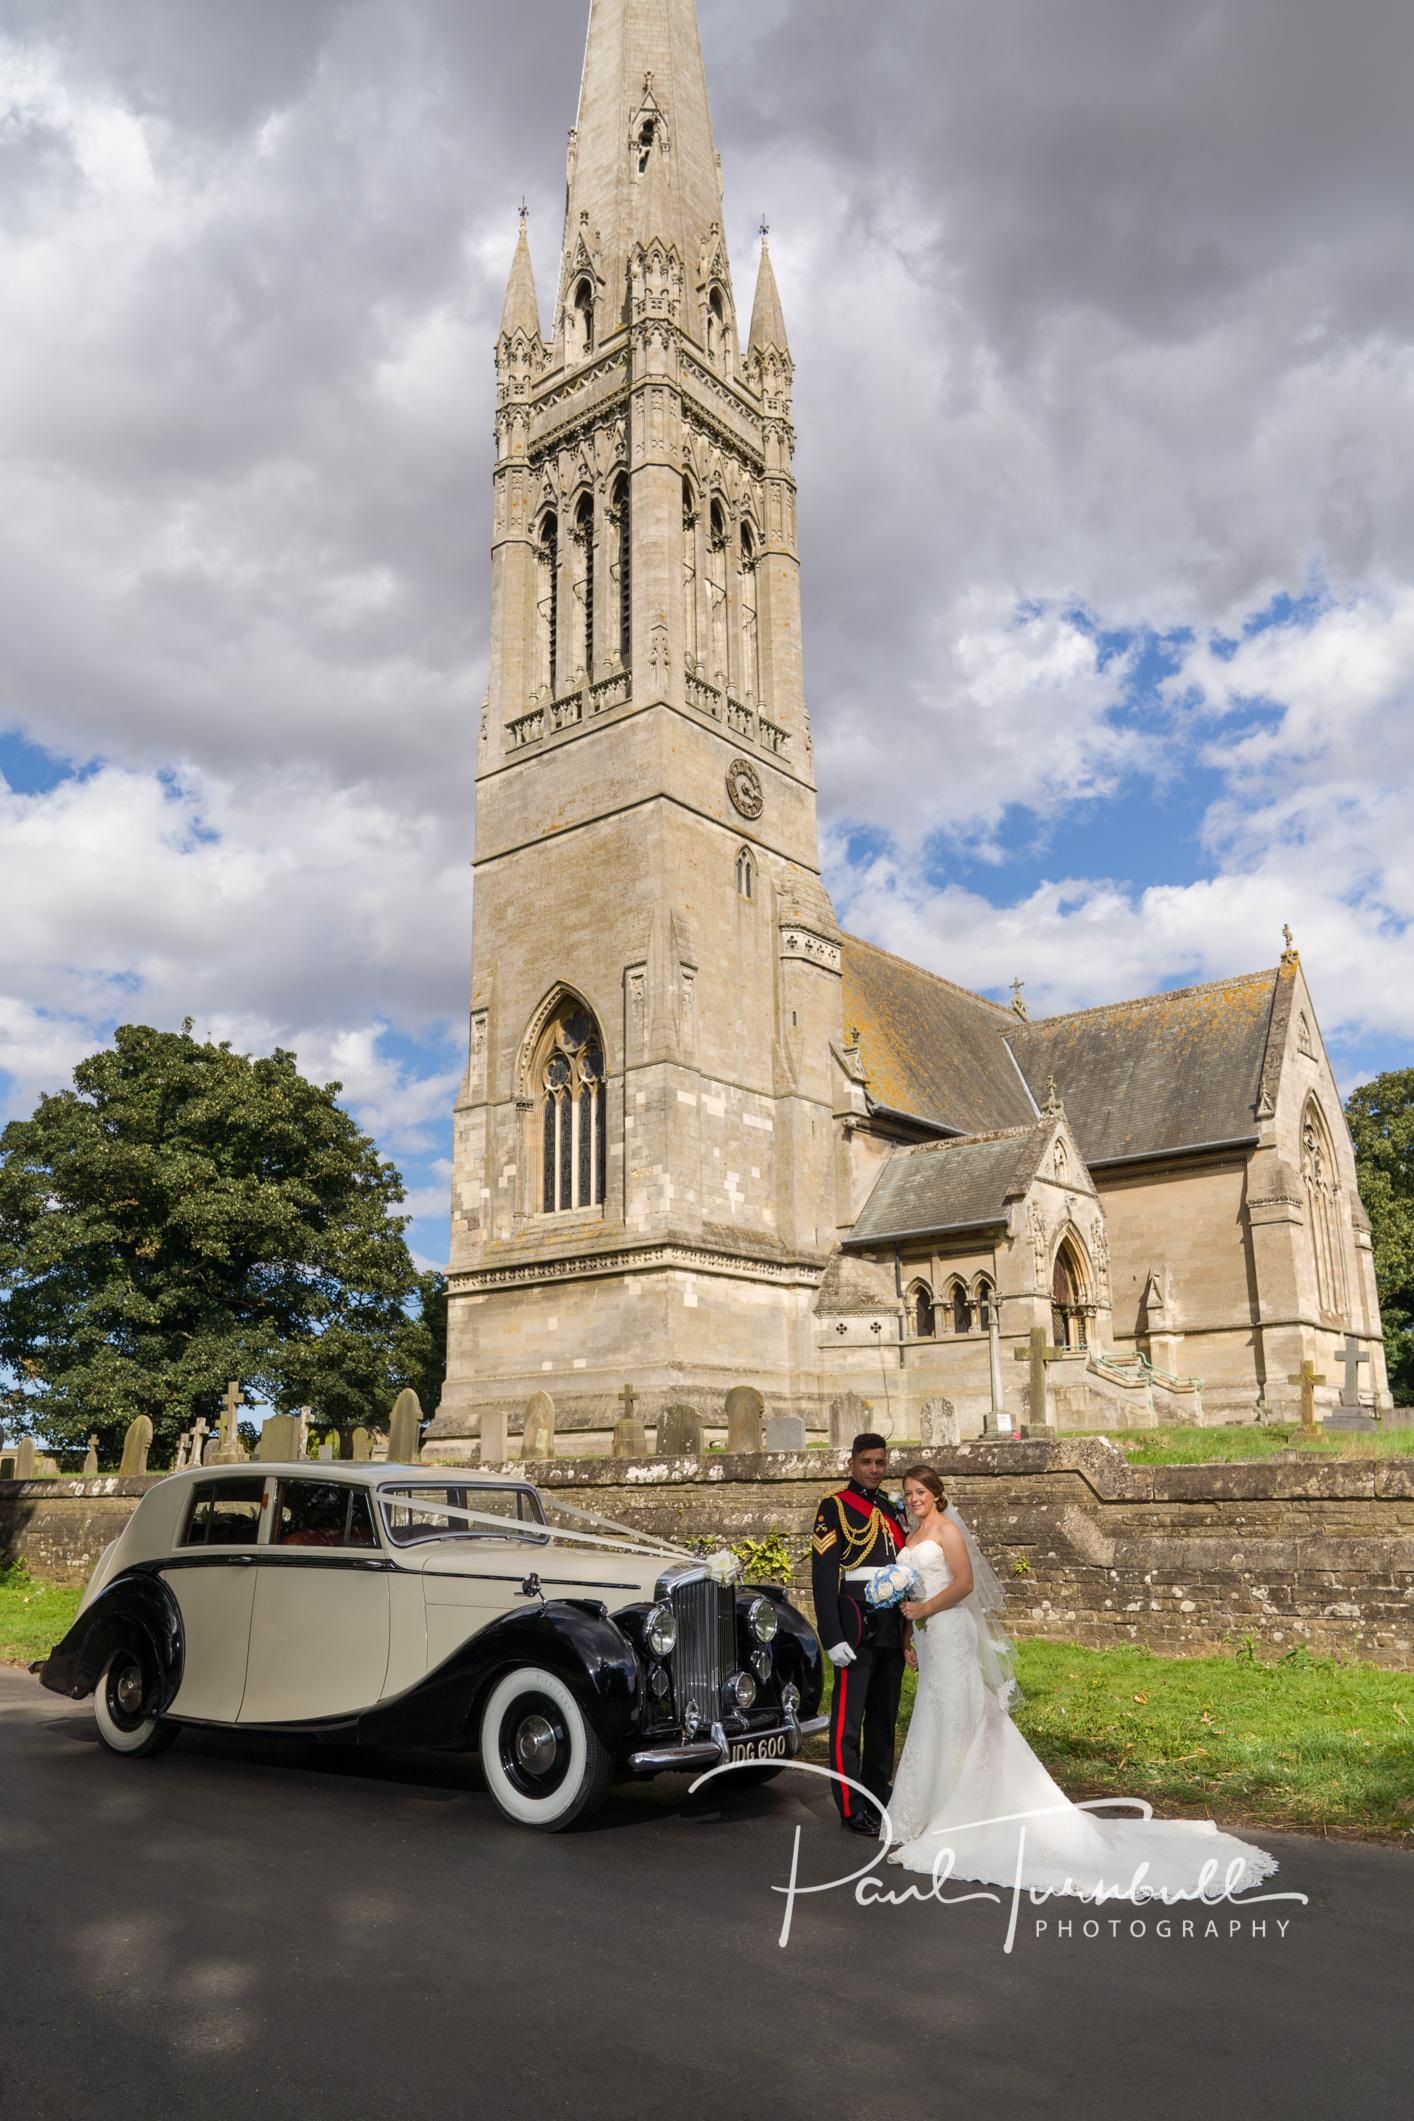 wedding-photographer-south-dalton-walkington-yorkshire-emma-james-052.jpg